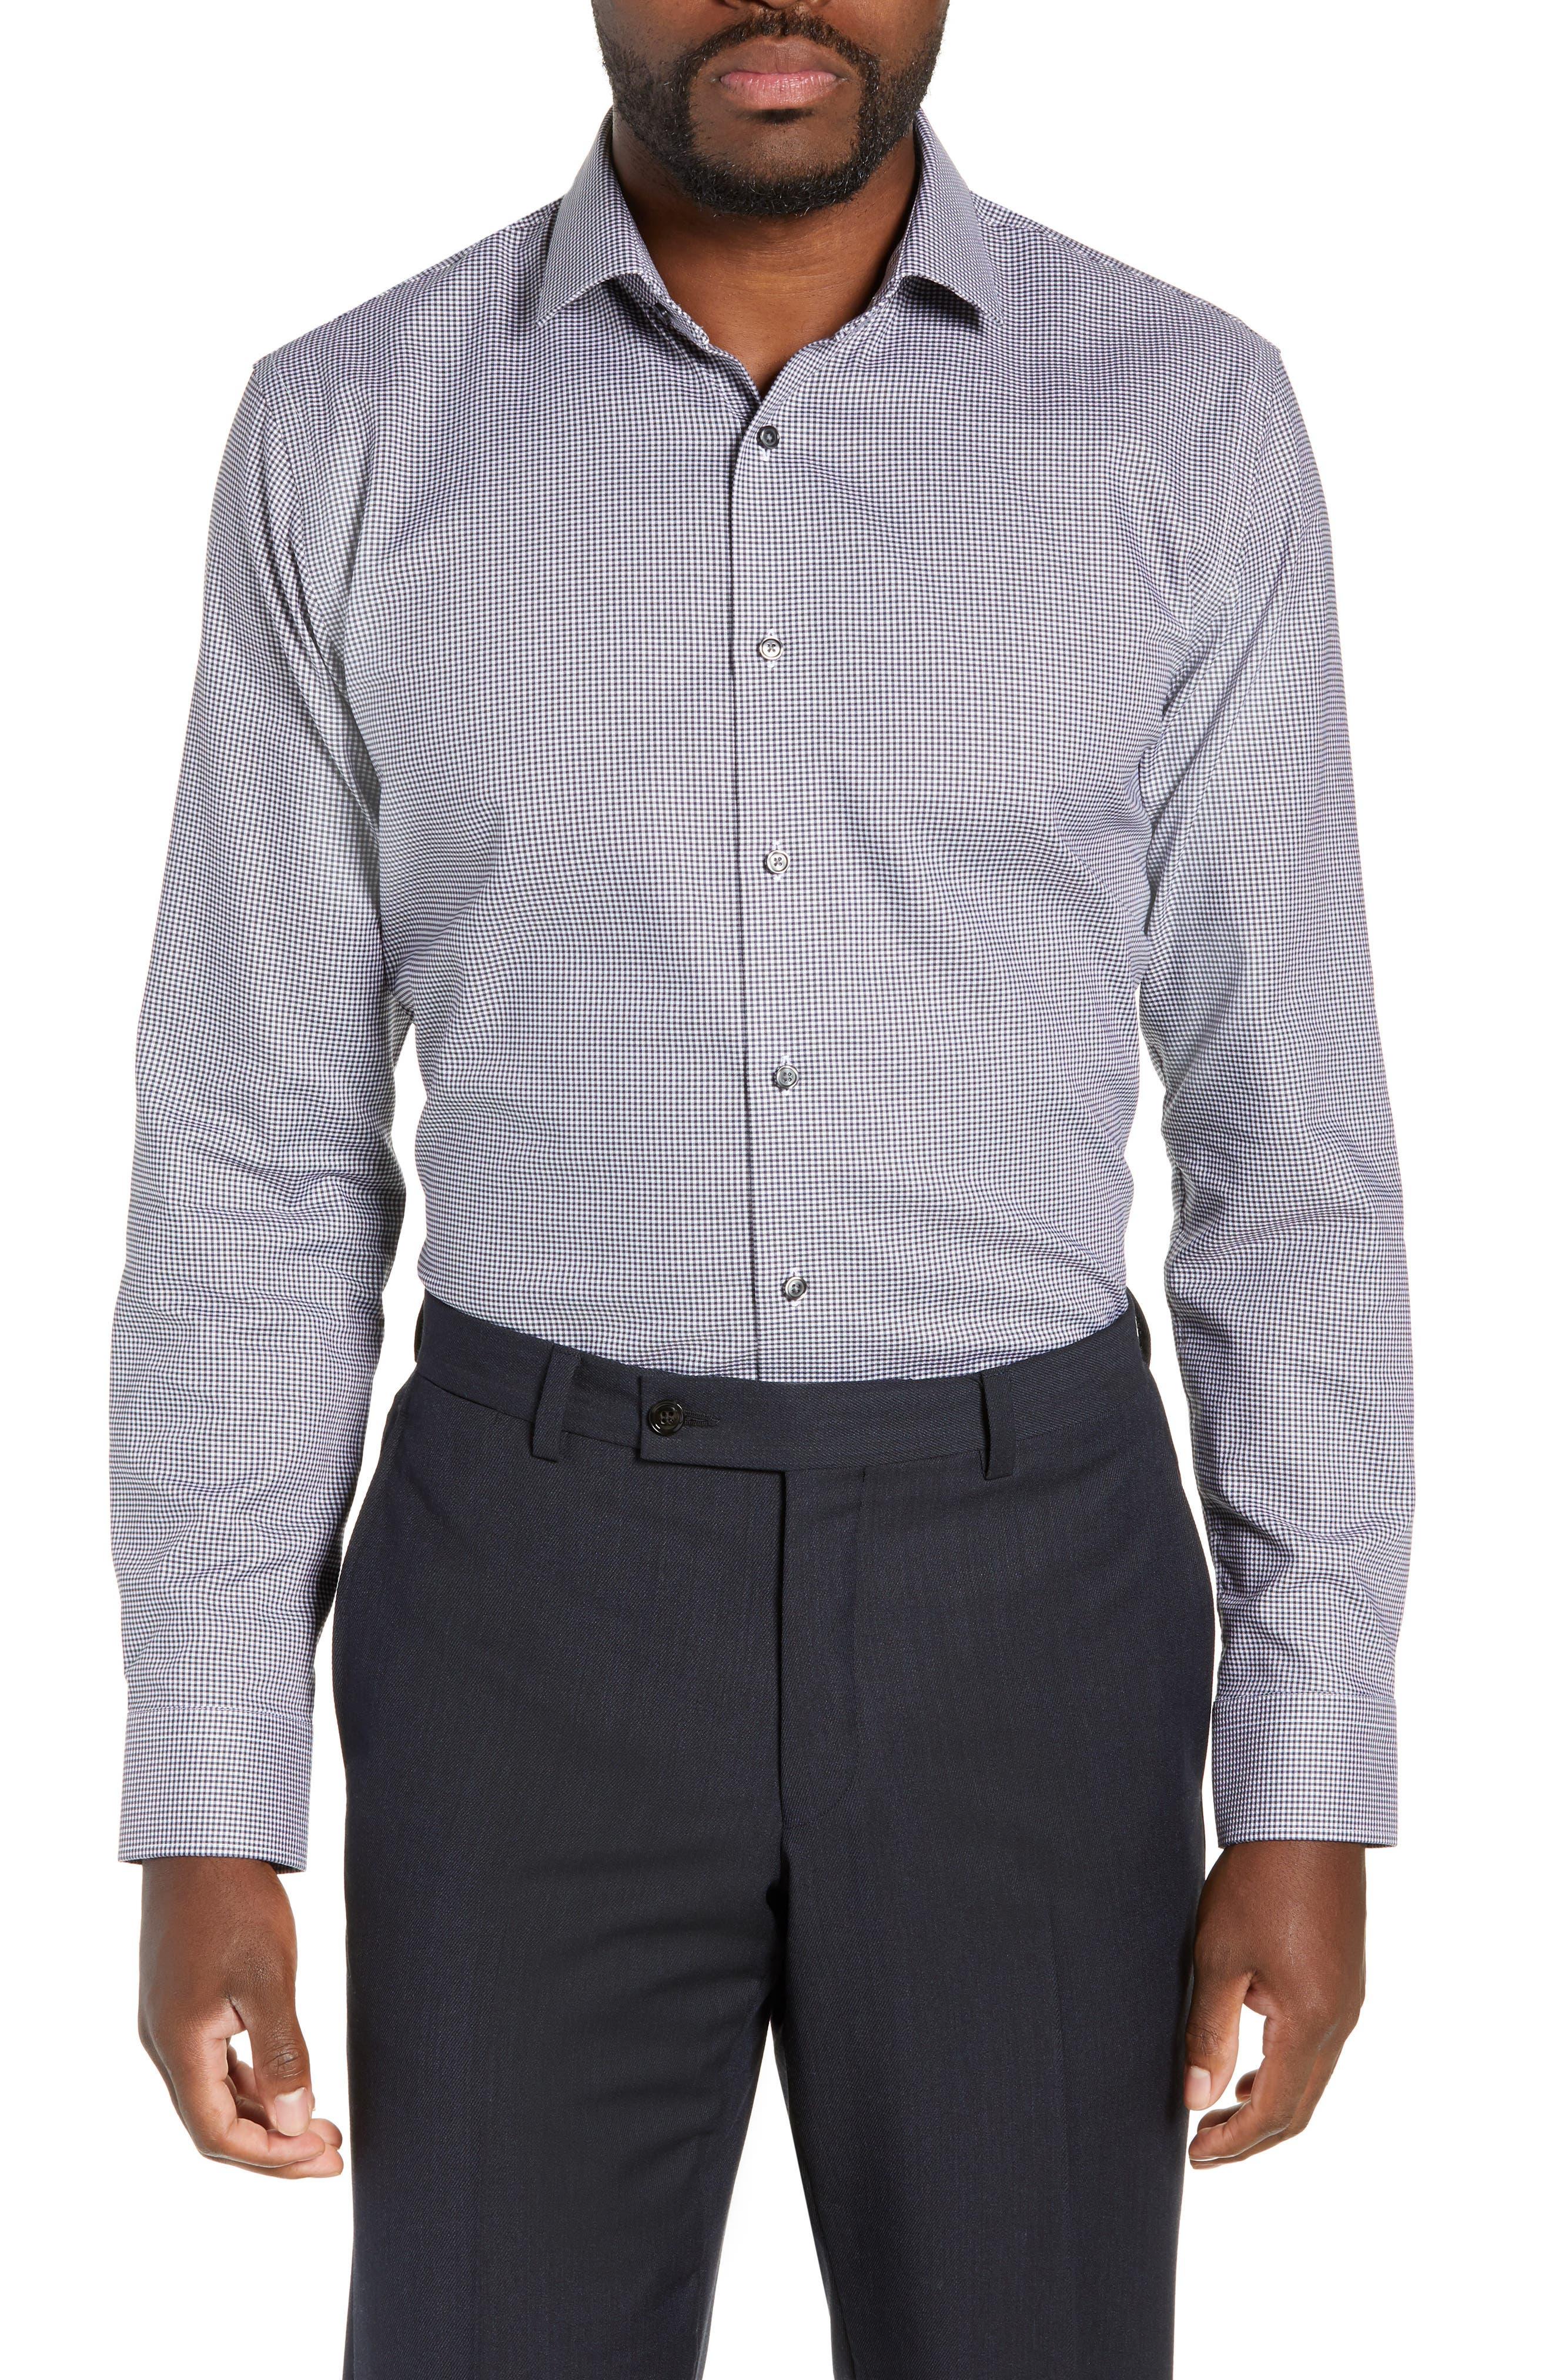 Trim Fit No-Iron Solid Dress Shirt,                             Main thumbnail 1, color,                             NAVY CHARCOAL